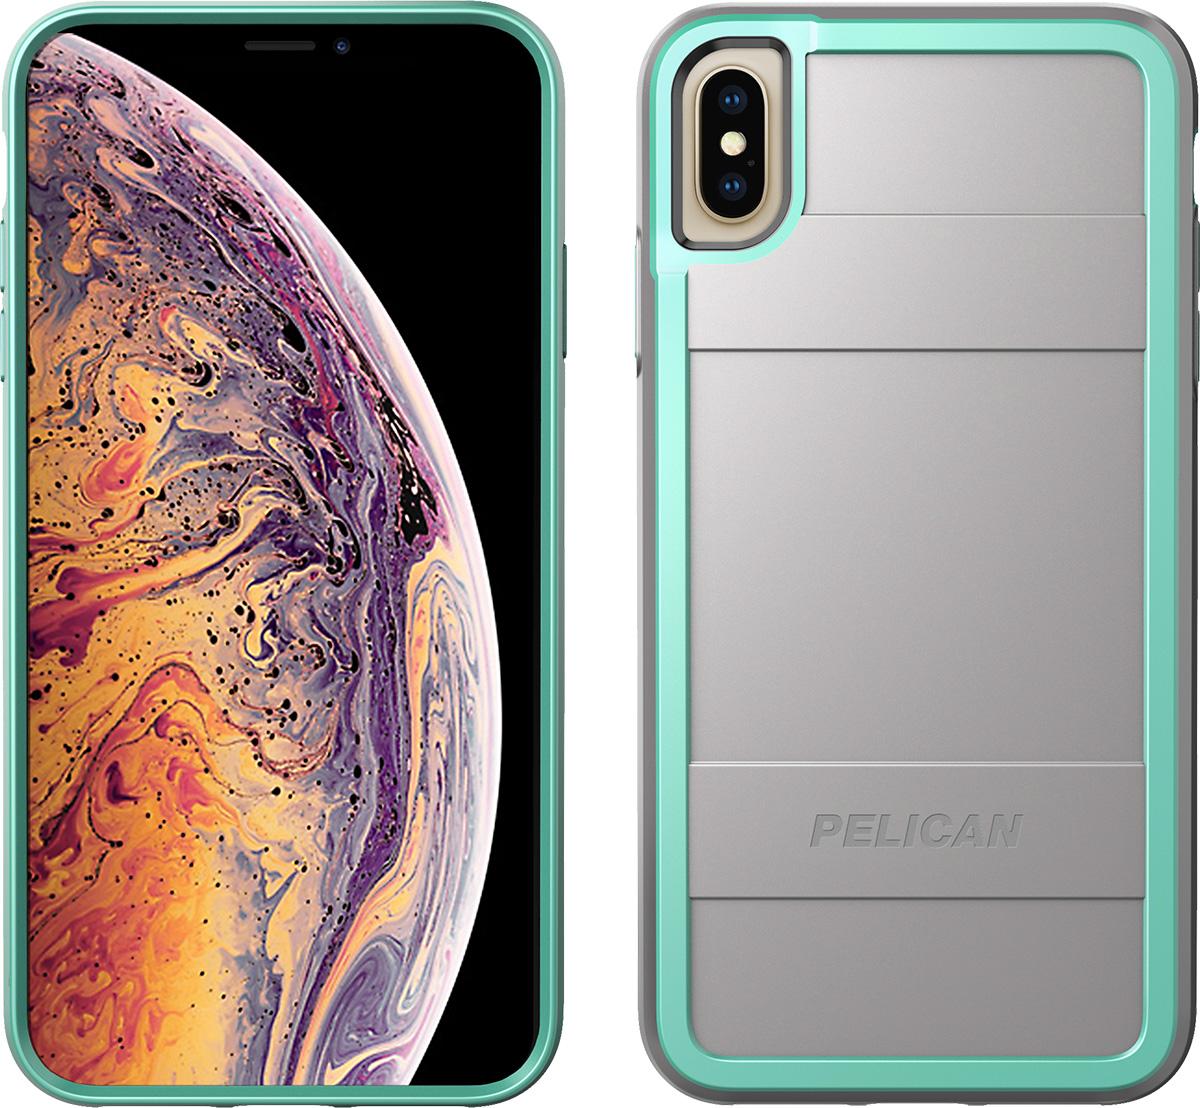 pelican c43000 apple iphone protector grey aqua phone case